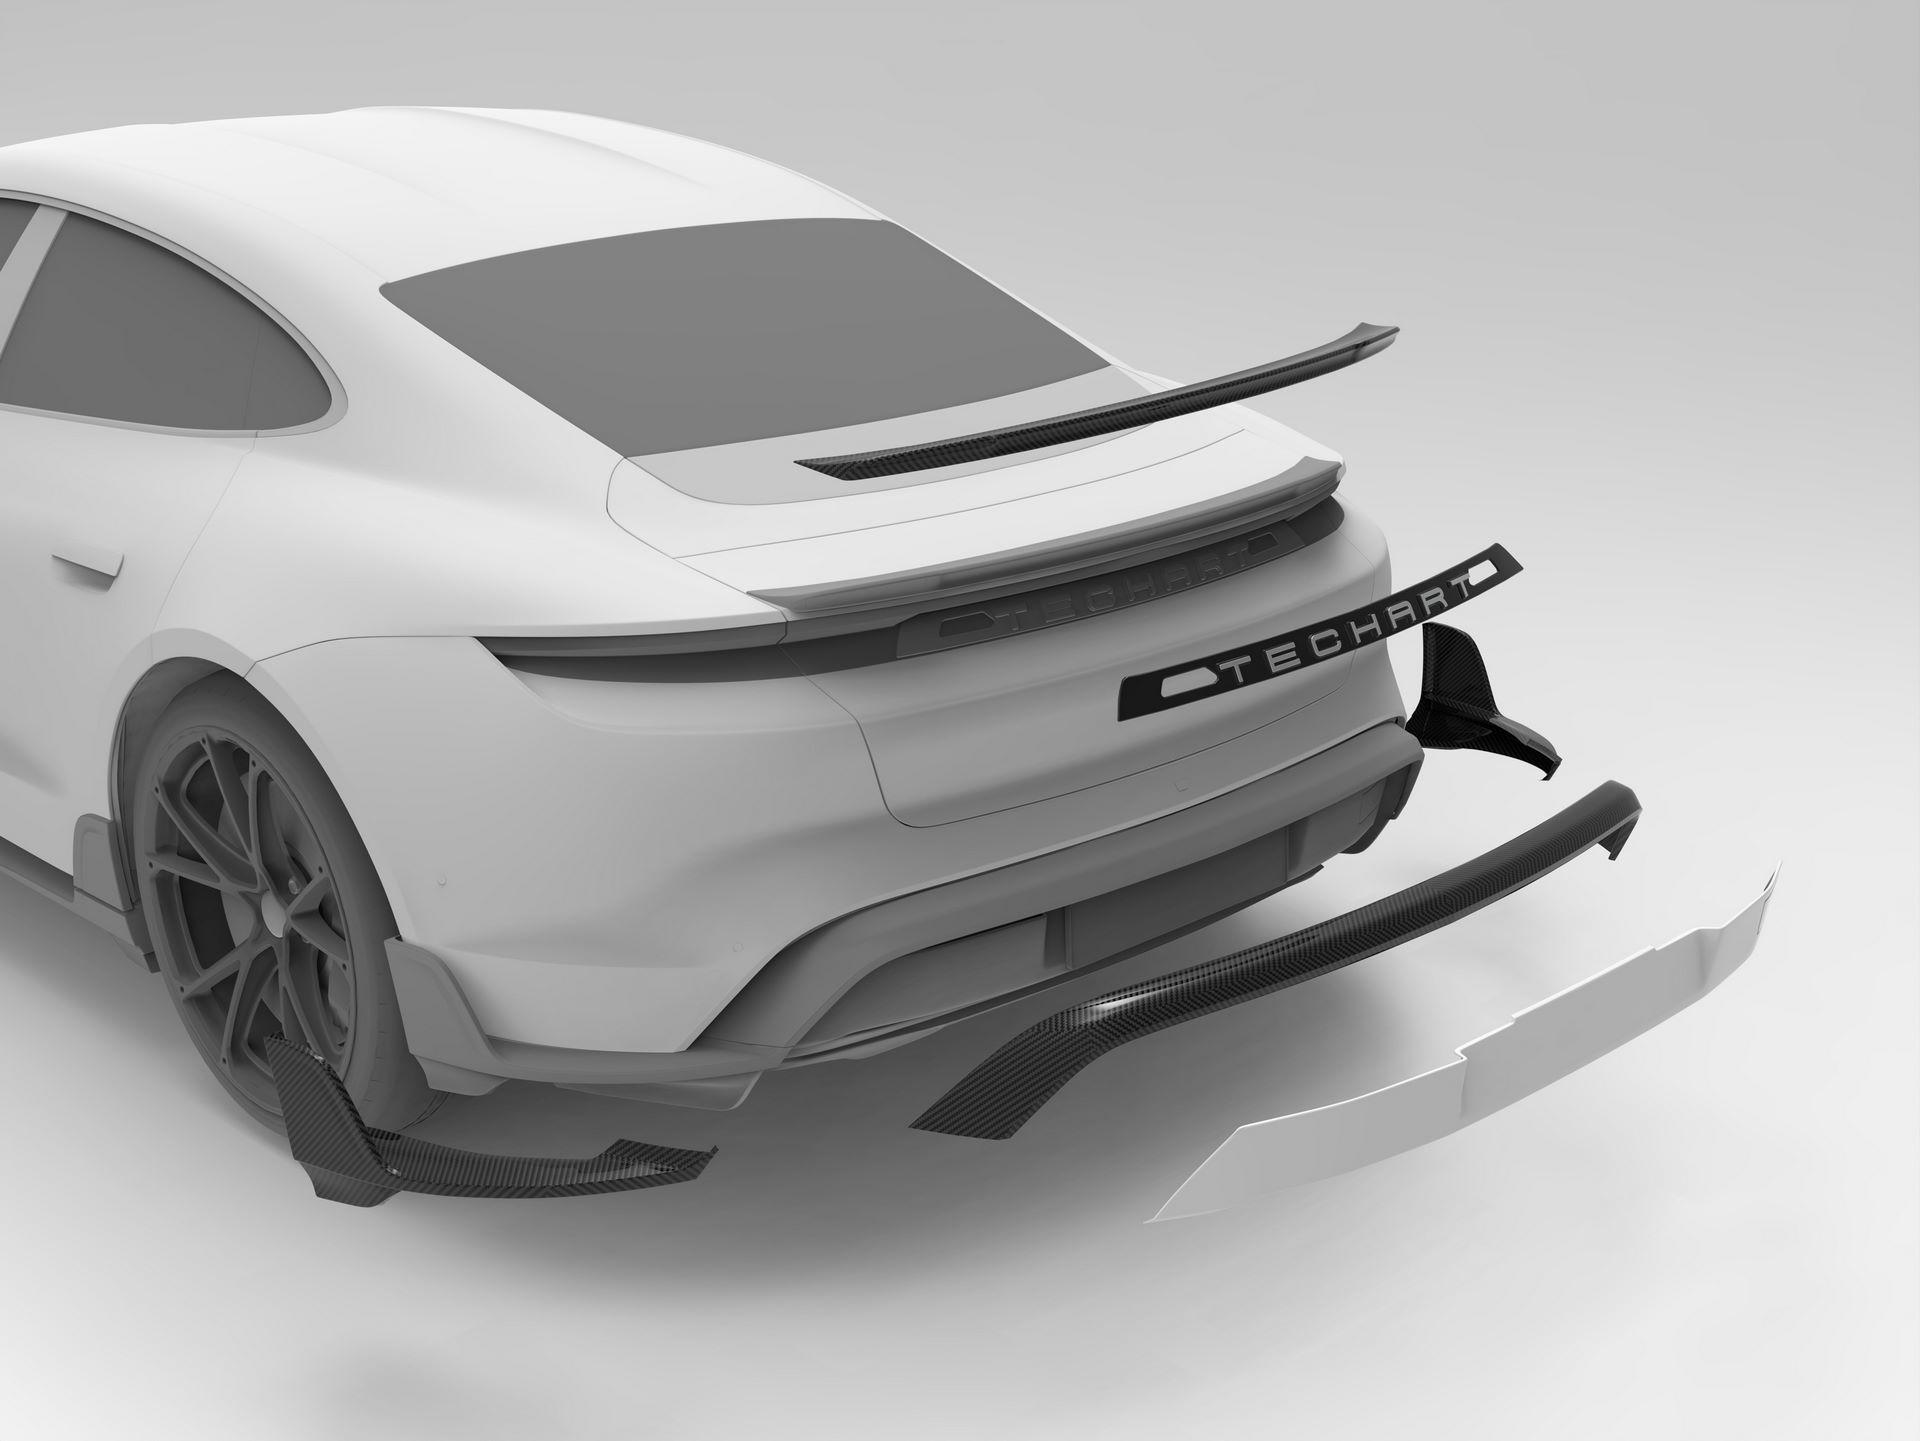 Porsche-Taycan-bodykit-by-TechArt-28